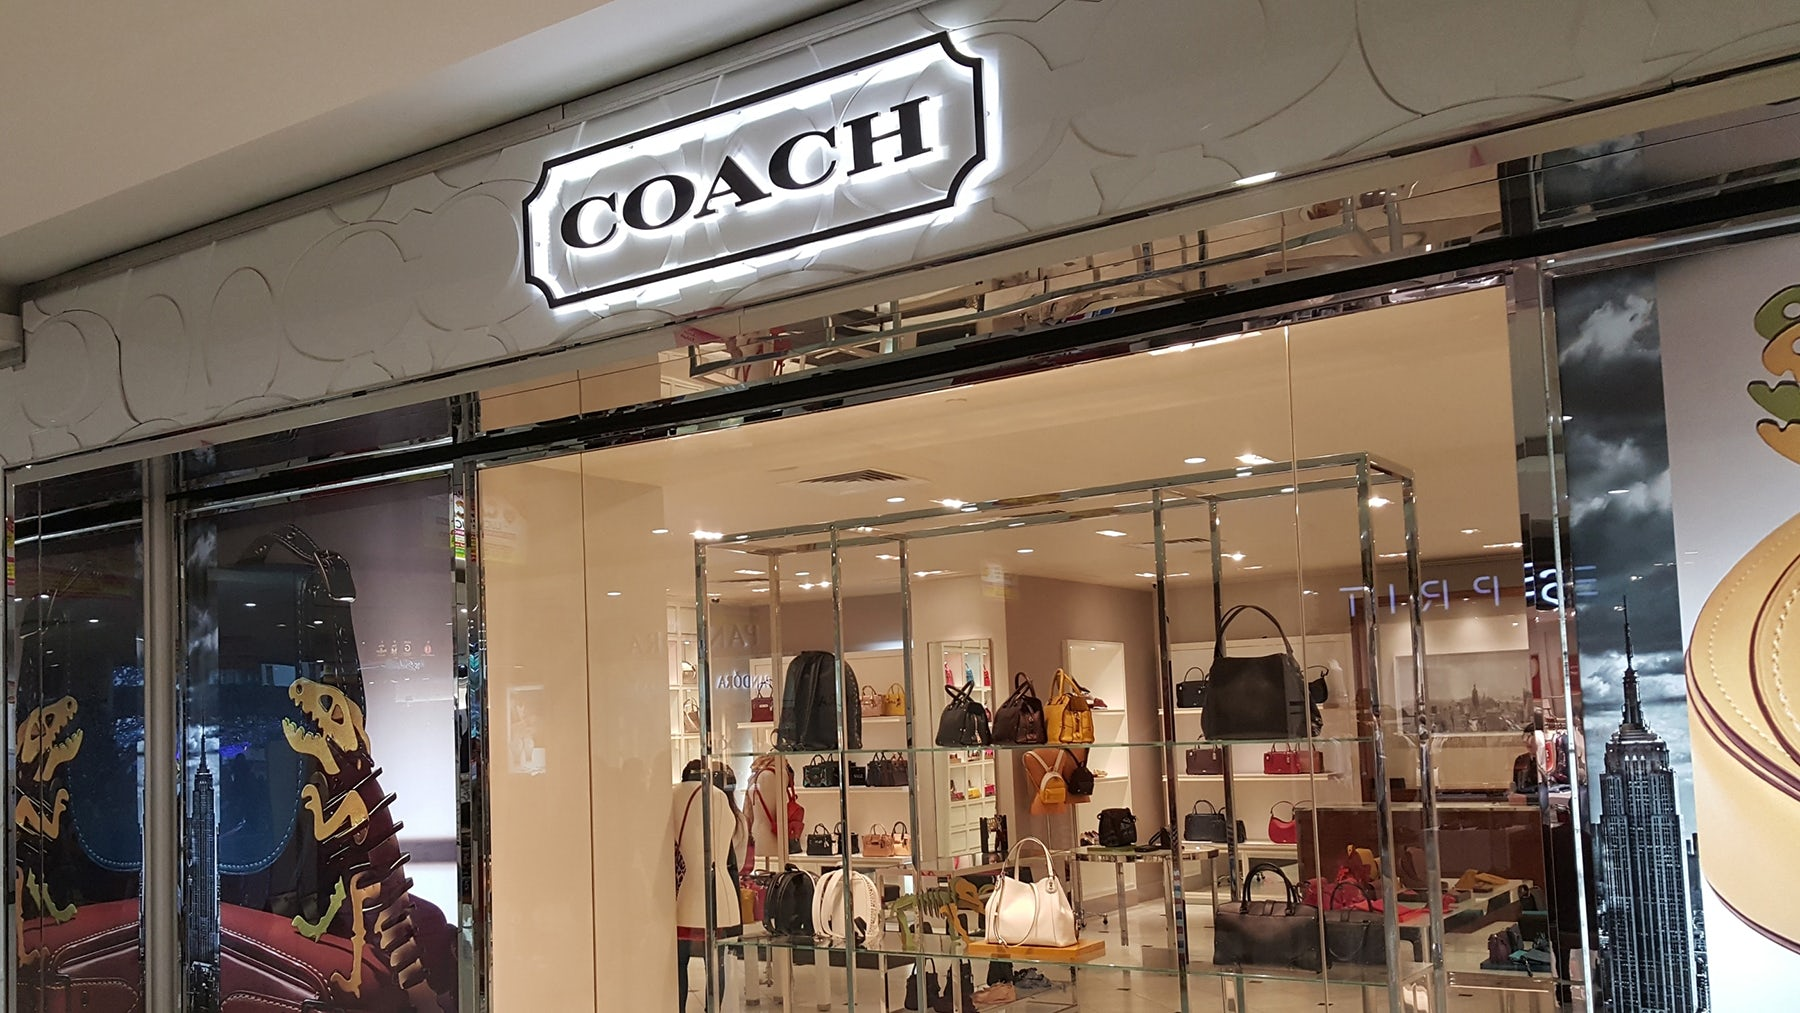 Tapestry Misses Revenue Estimates on Surprise Drop in Coach Sales